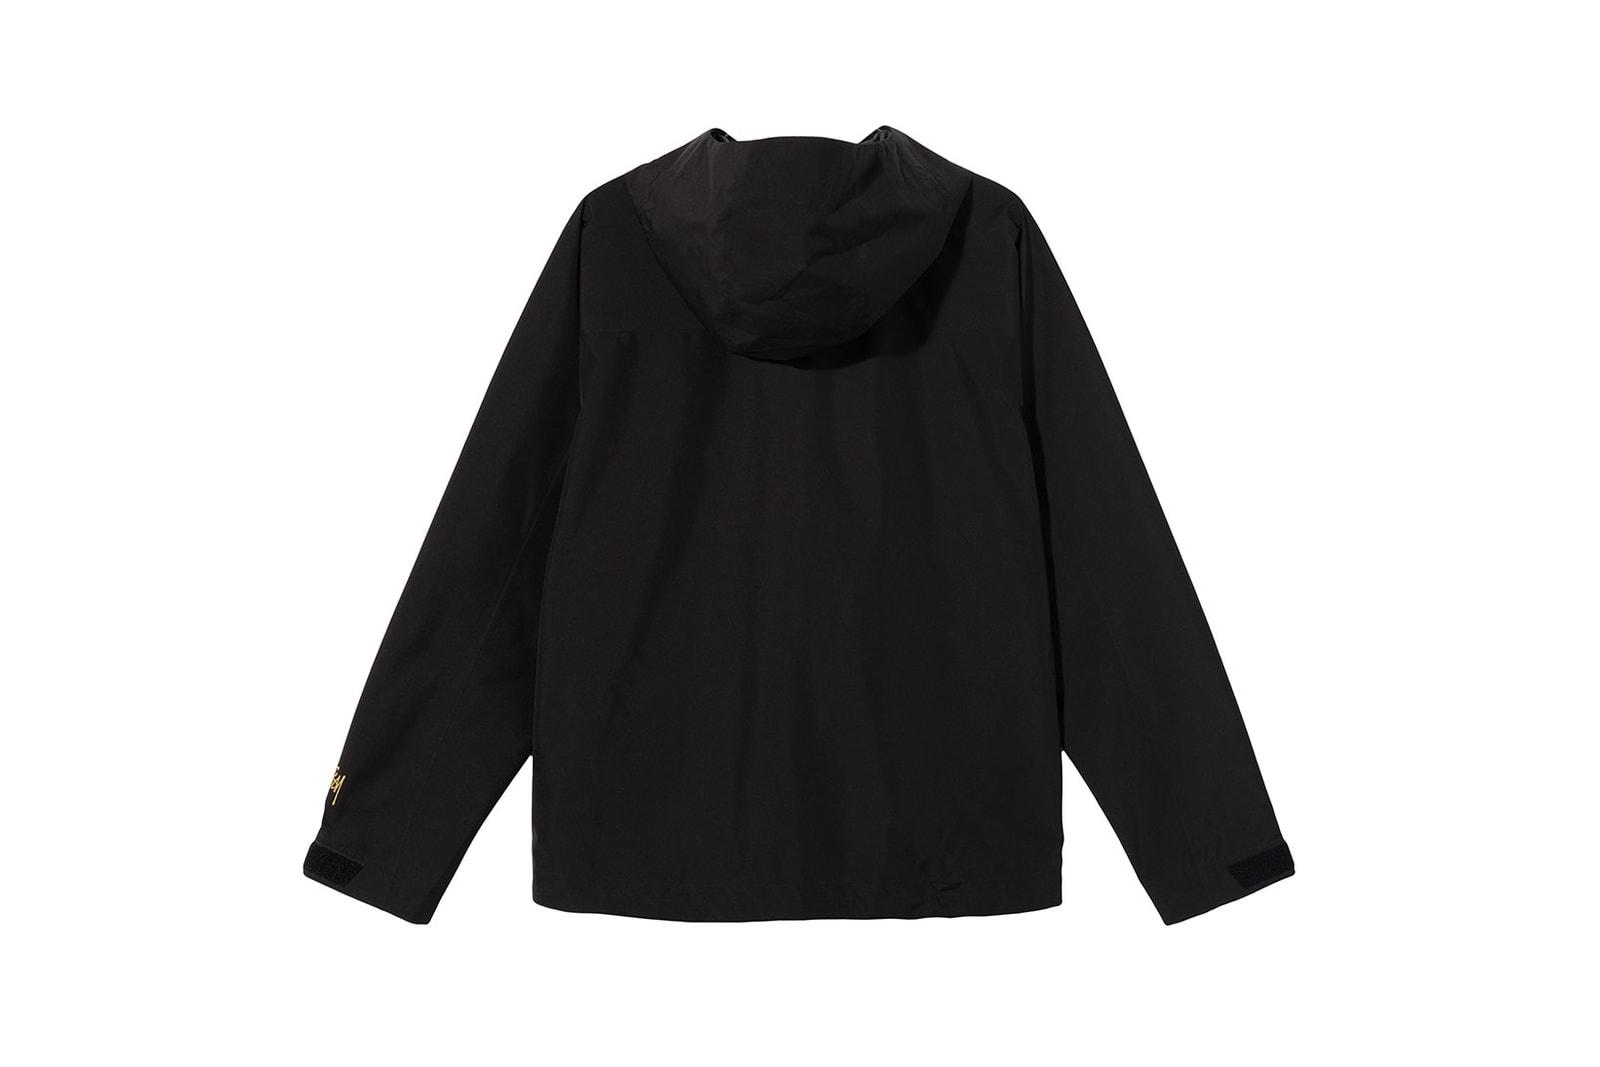 stussy goretex apparel collaboration jacket pants hat black camo